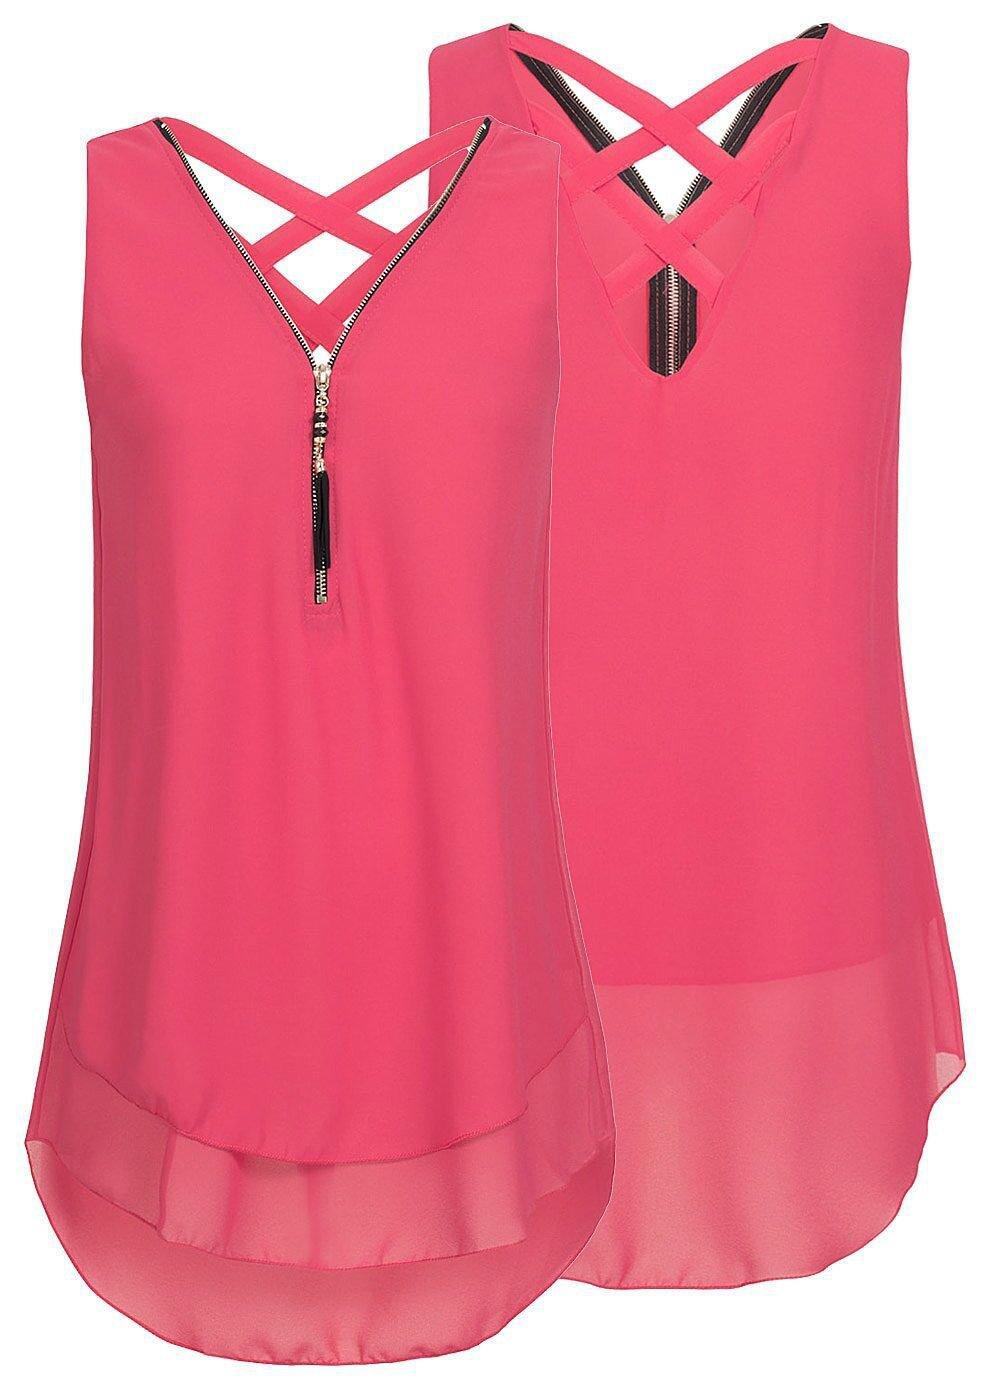 Yknktstc Womens Casual Sleeveless V Neck Chiffon Tank Top Crisscross Back Zipper Blouse T Shirt Large Style 2-Melon Red by Yknktstc